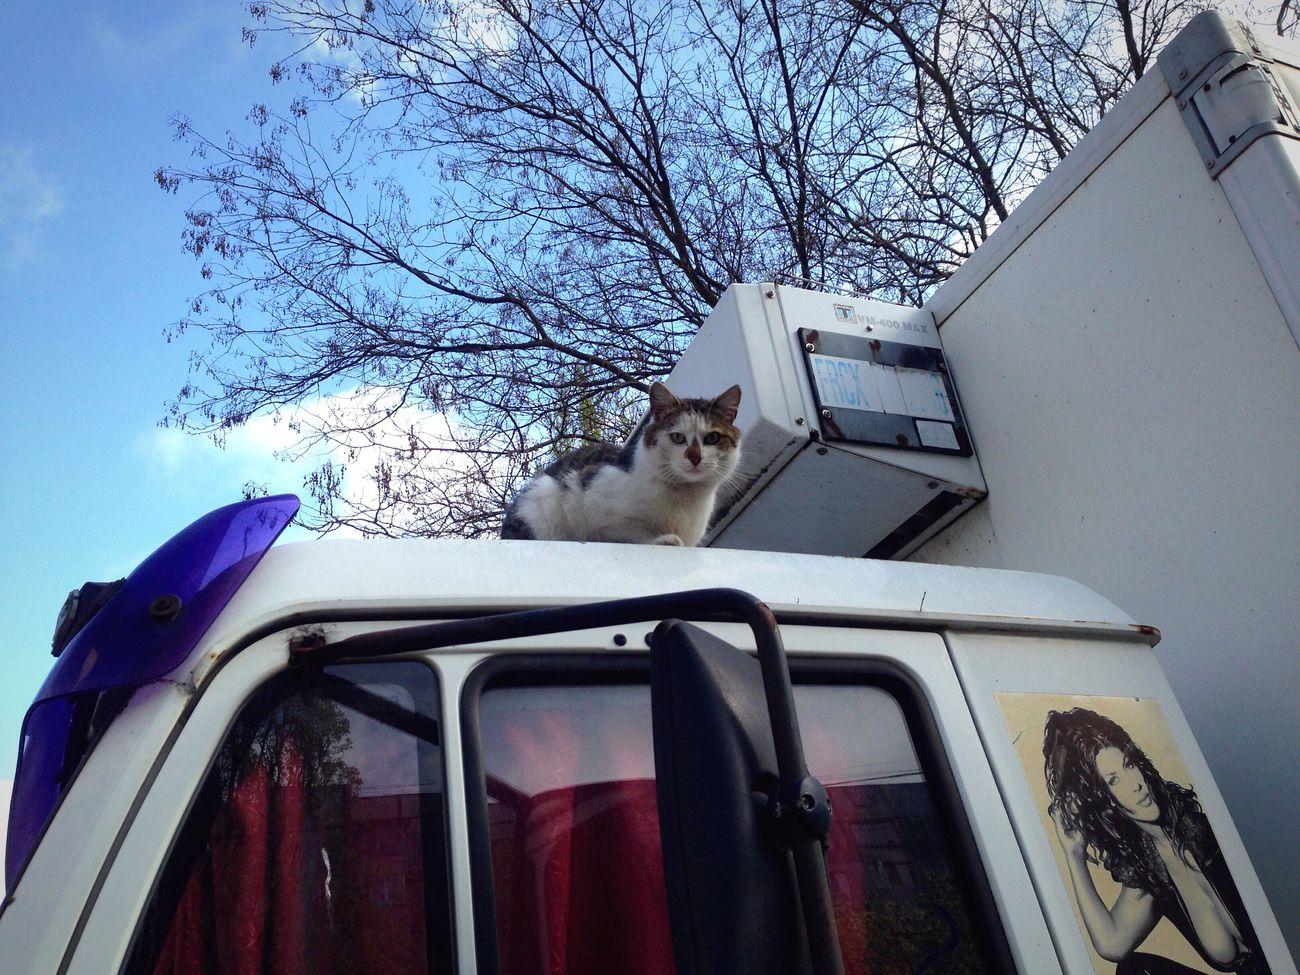 Cat Cat♡ Homeless Cats Cats